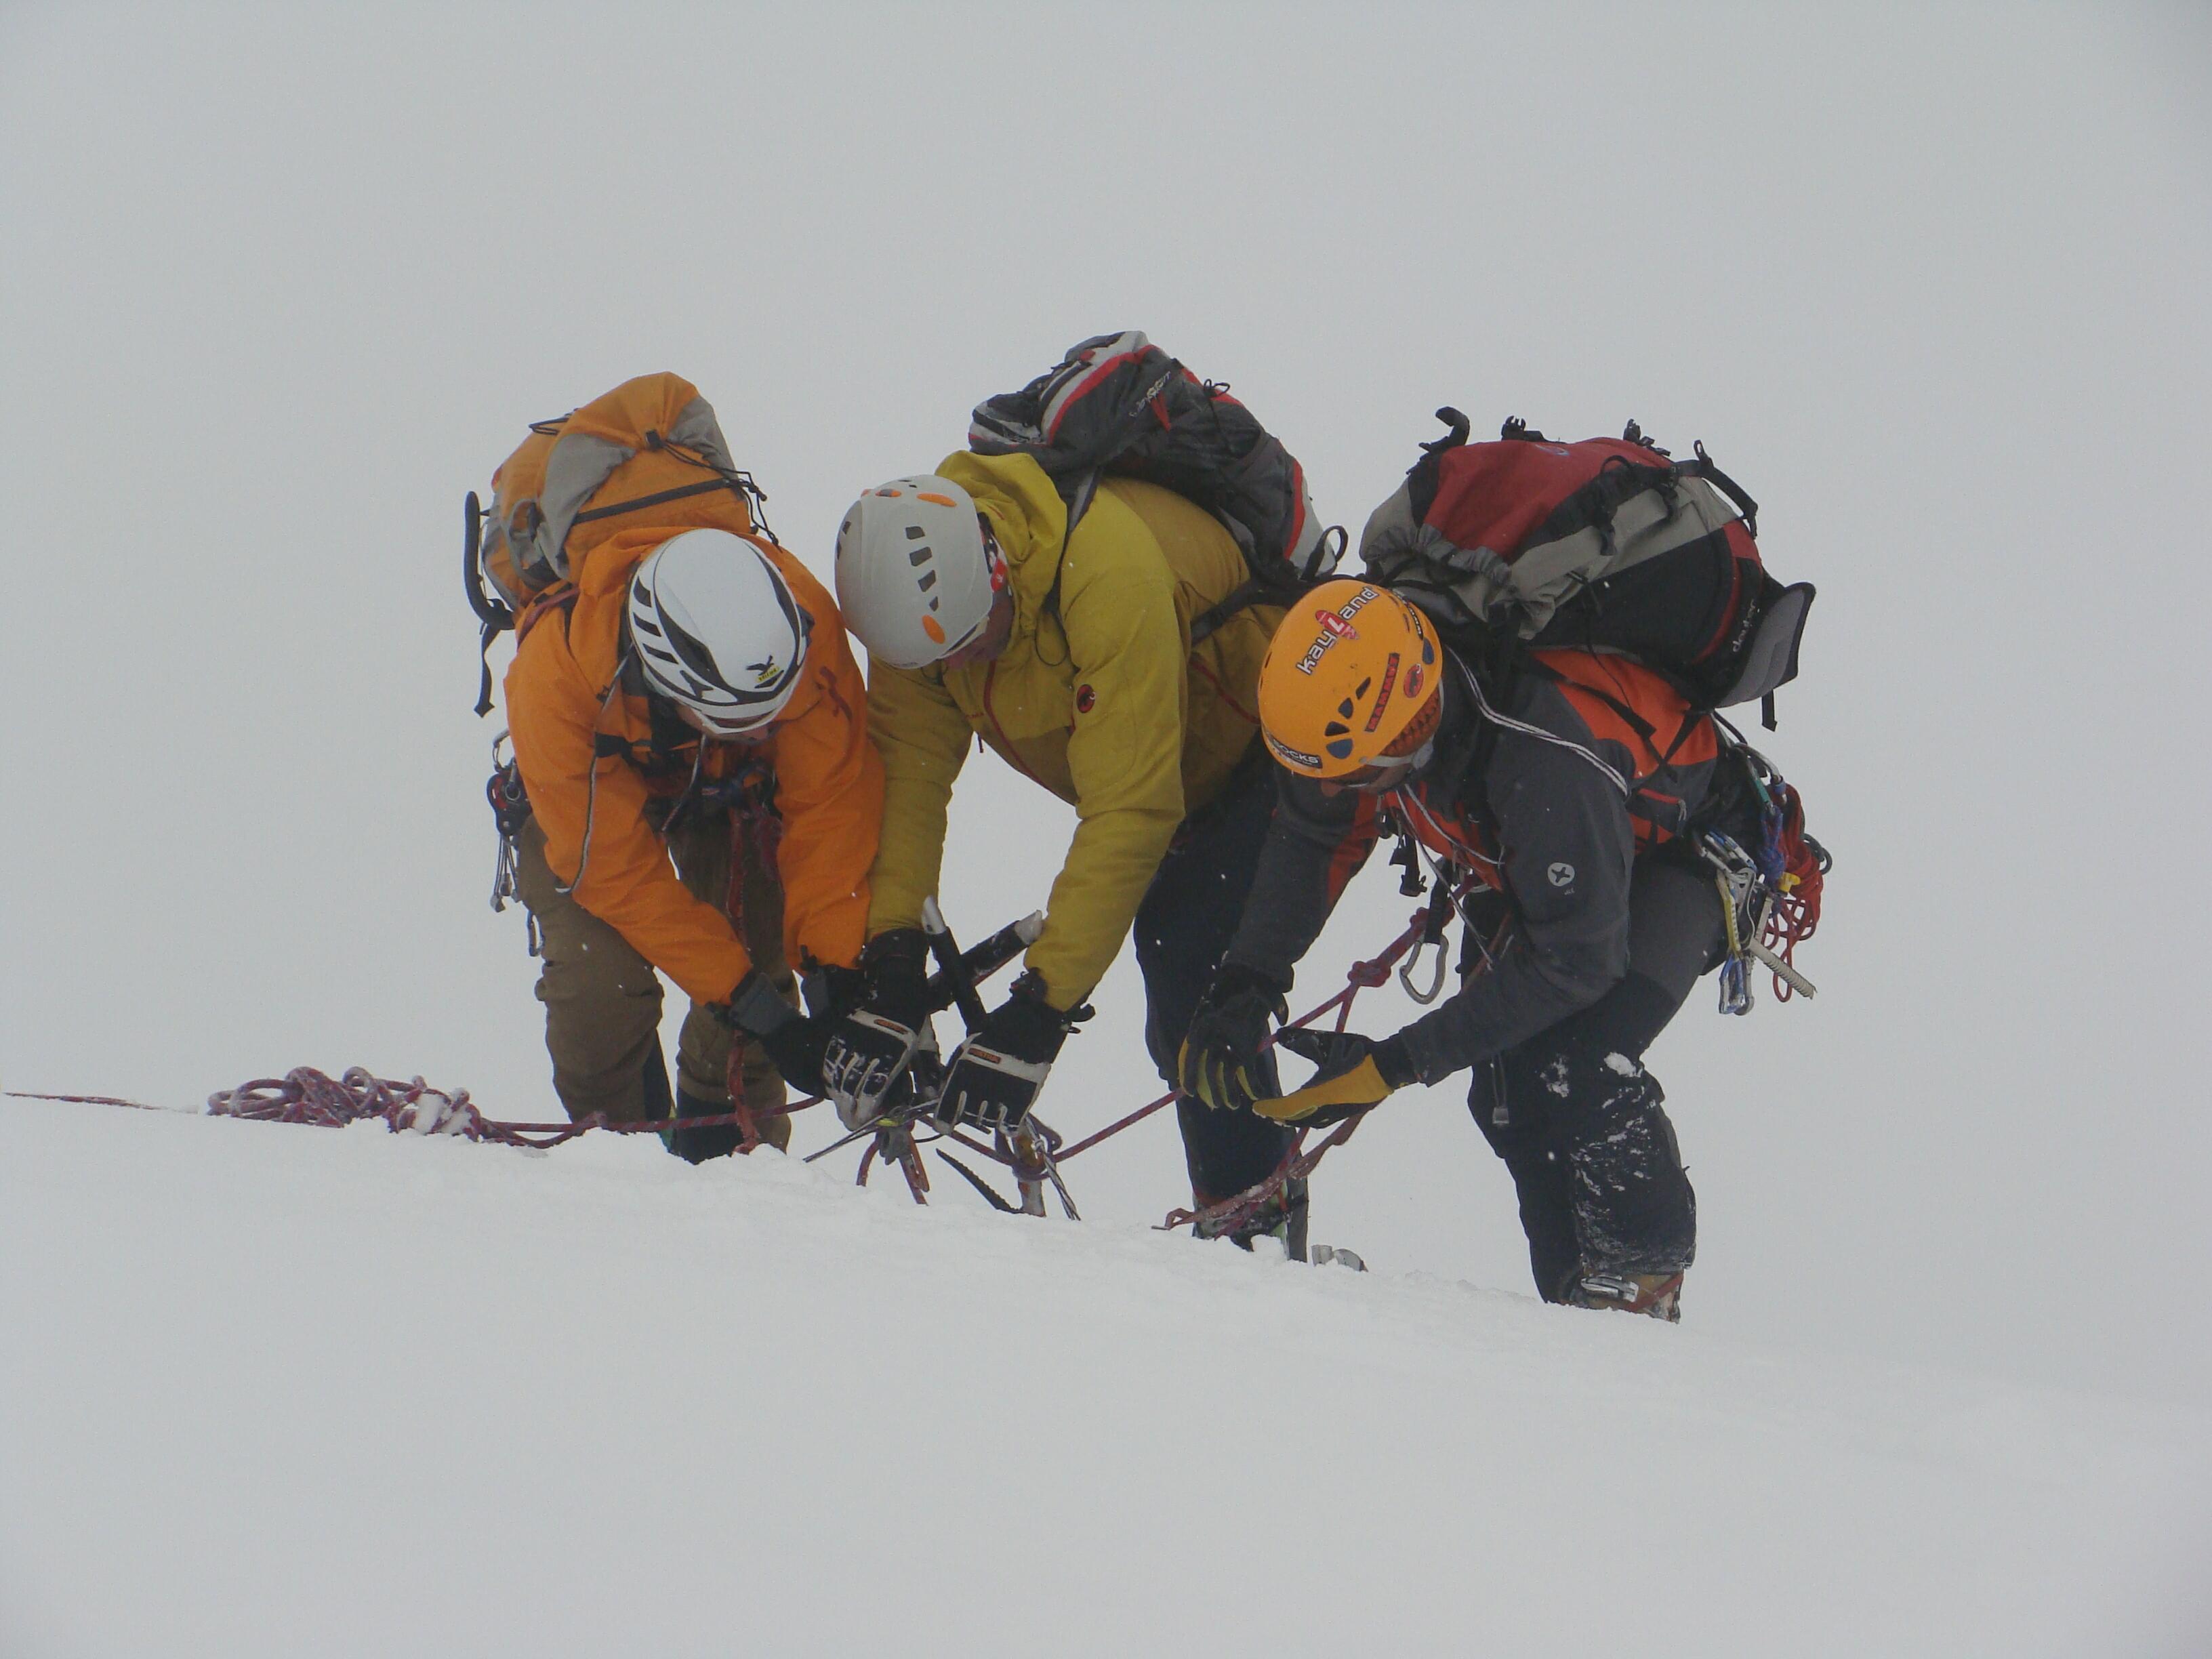 štand pod vrcholom Brochkogel